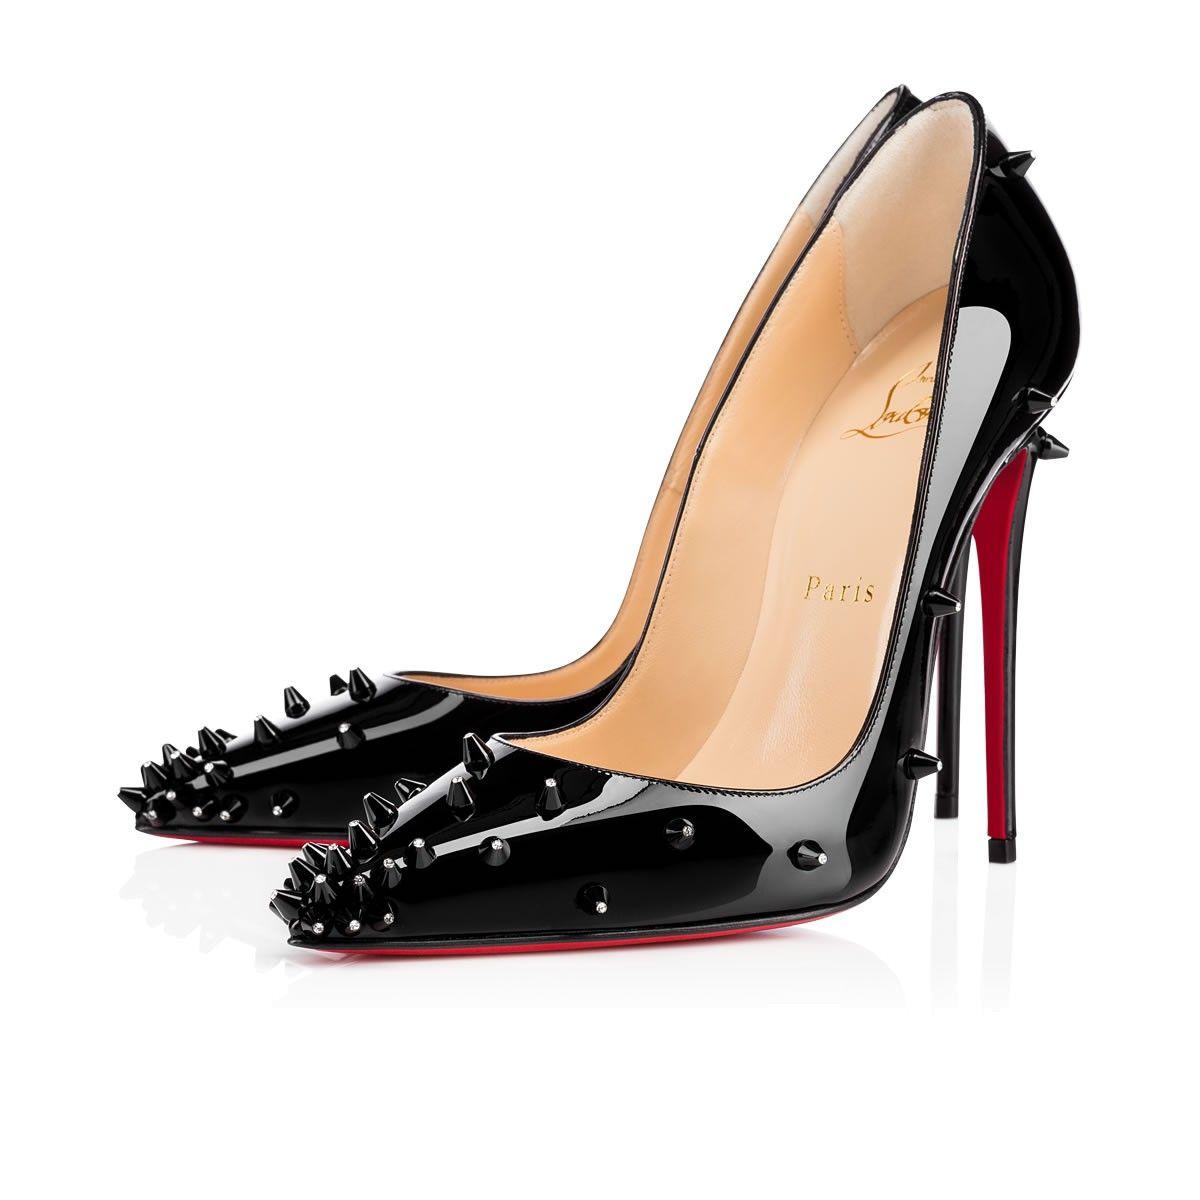 Diamond Spike 120 Black Patent Leather - Women Shoes - Christian Louboutin